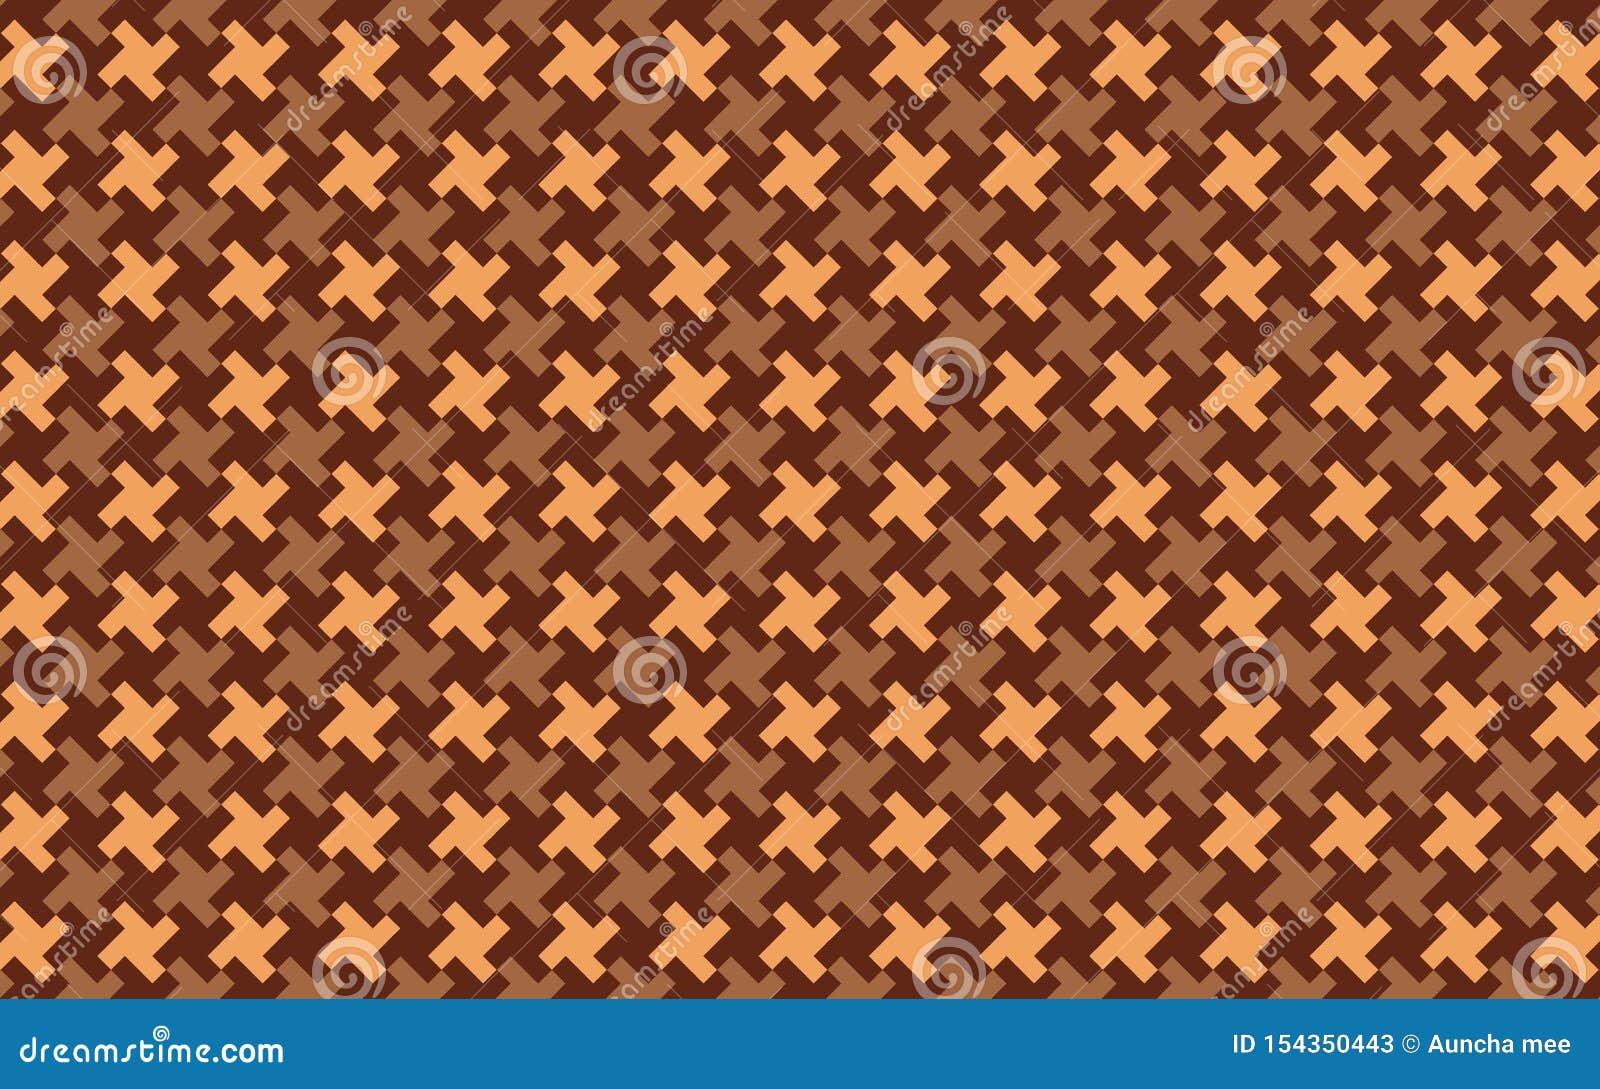 Seamless houndtooth pattern. Illustration design